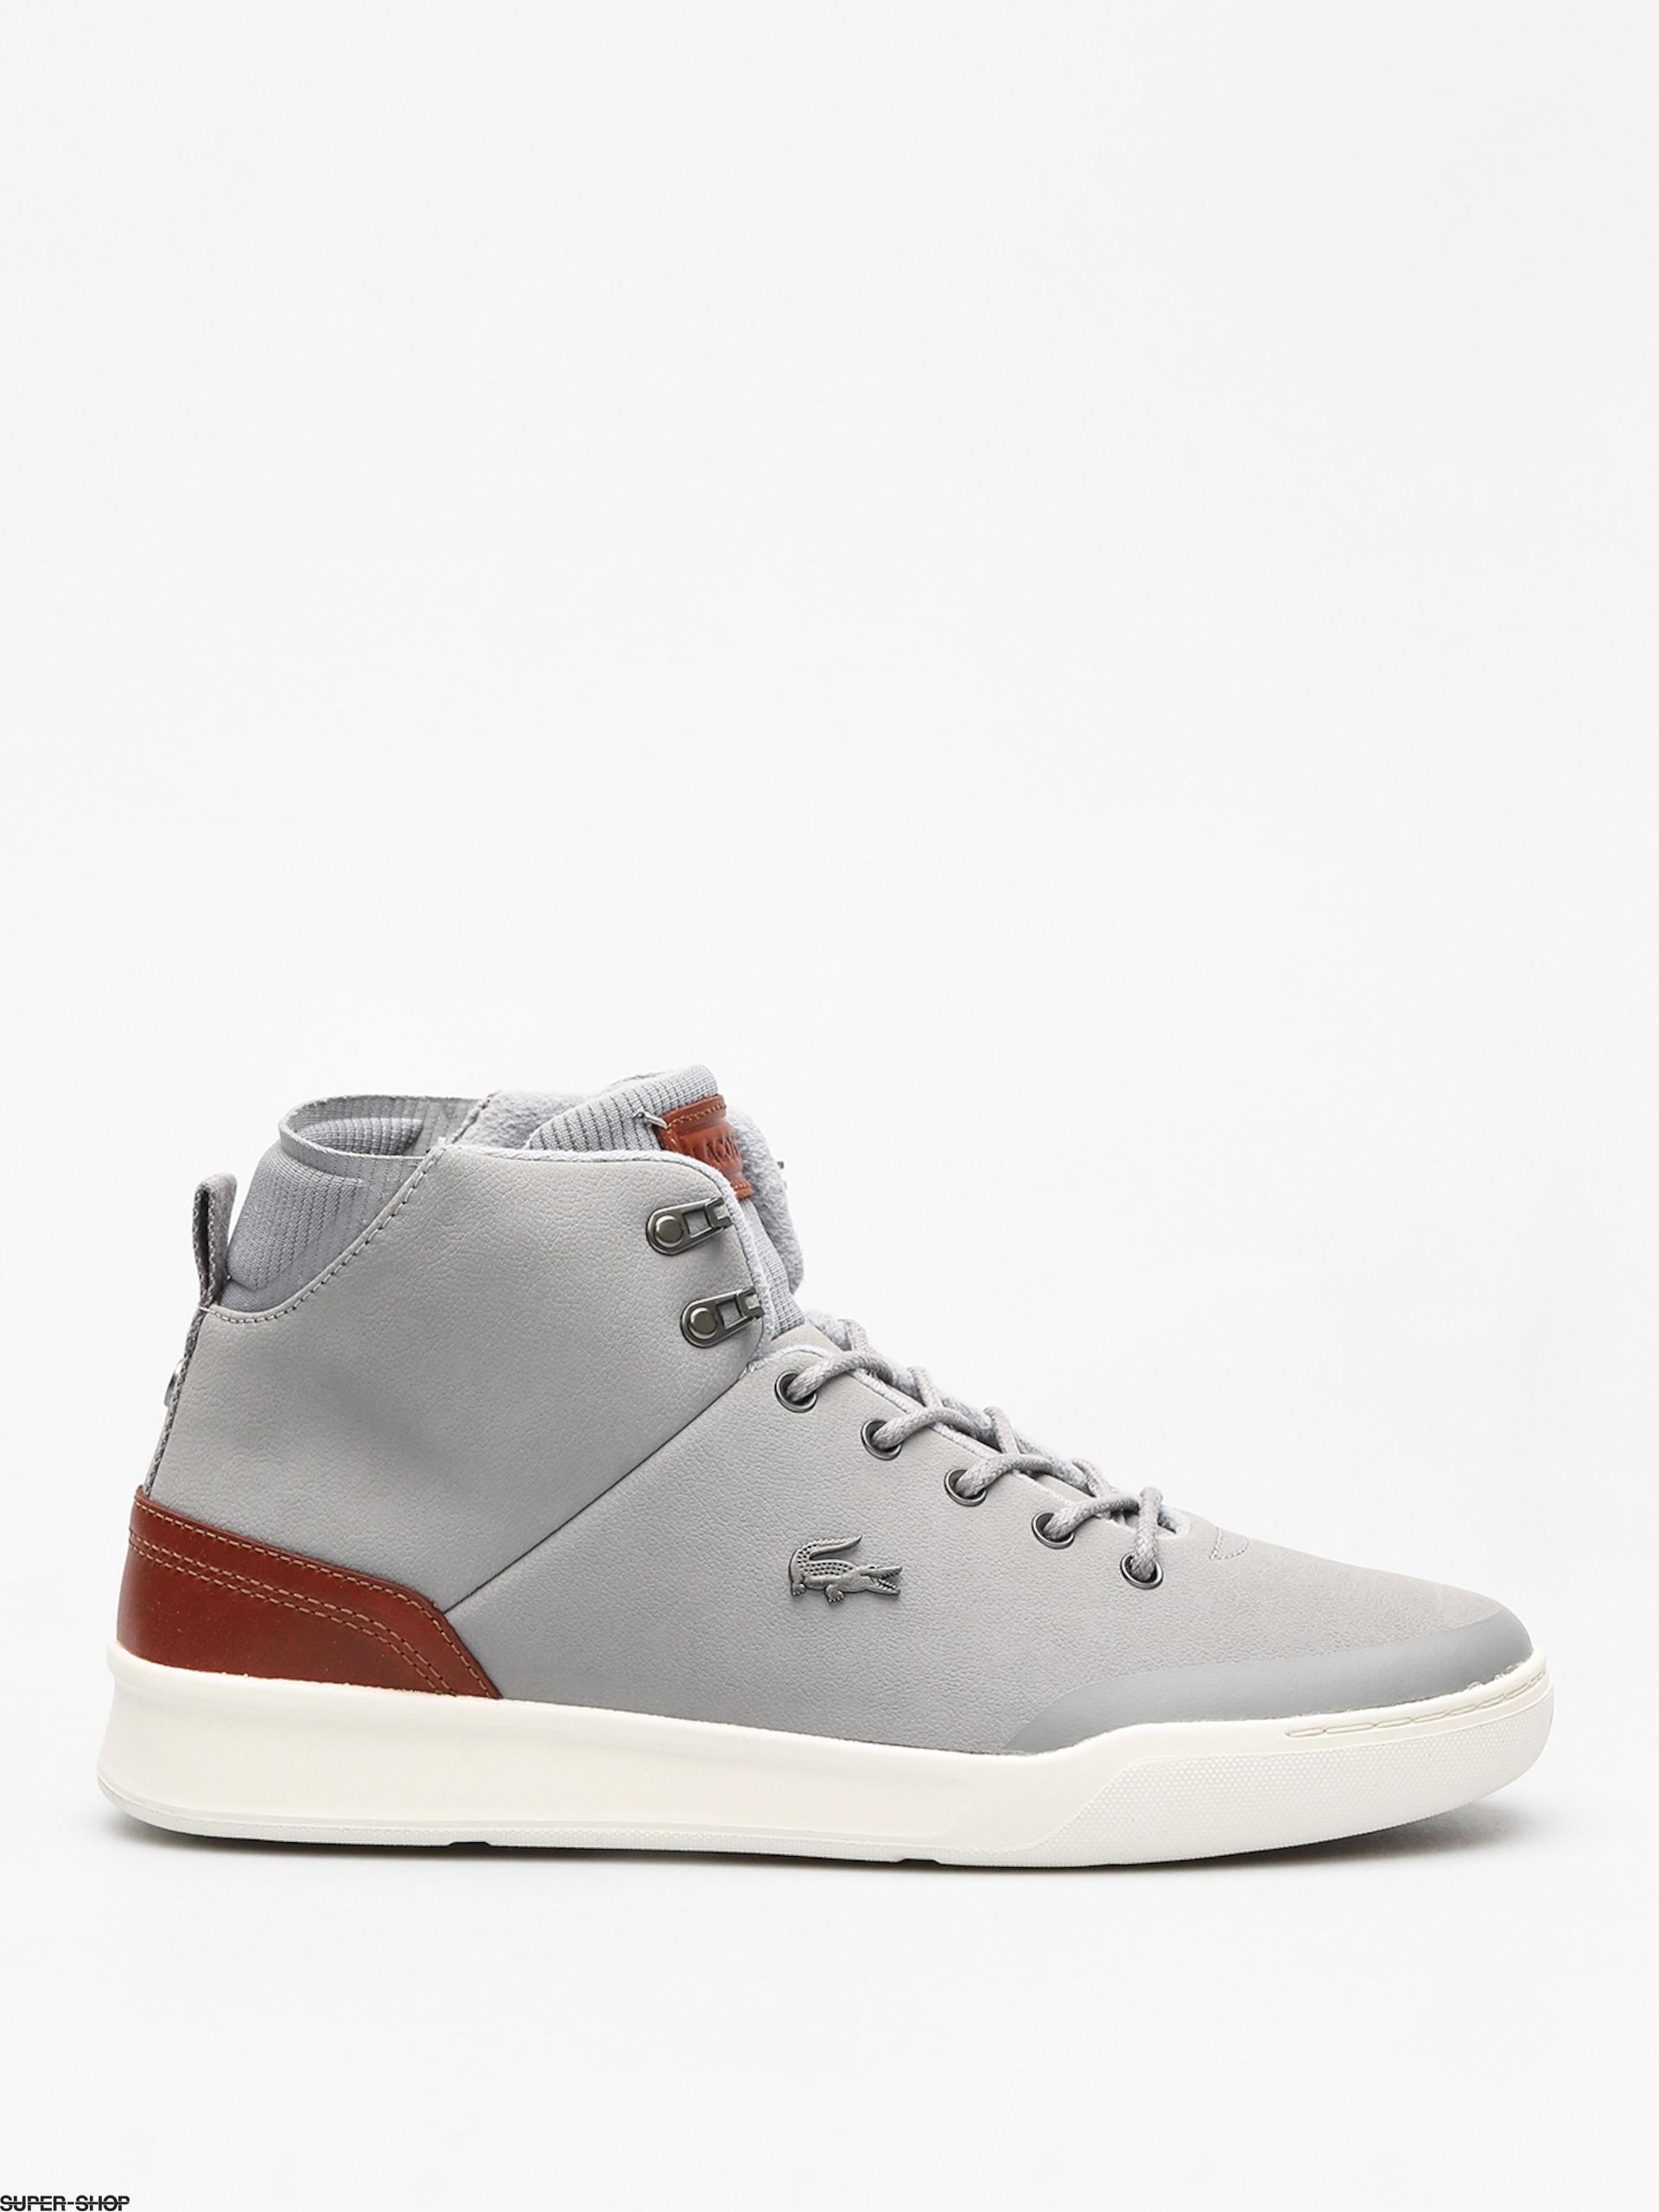 00e015eaadb19 Lacoste Shoes Explorateur Classic 318 2 (grey brown)